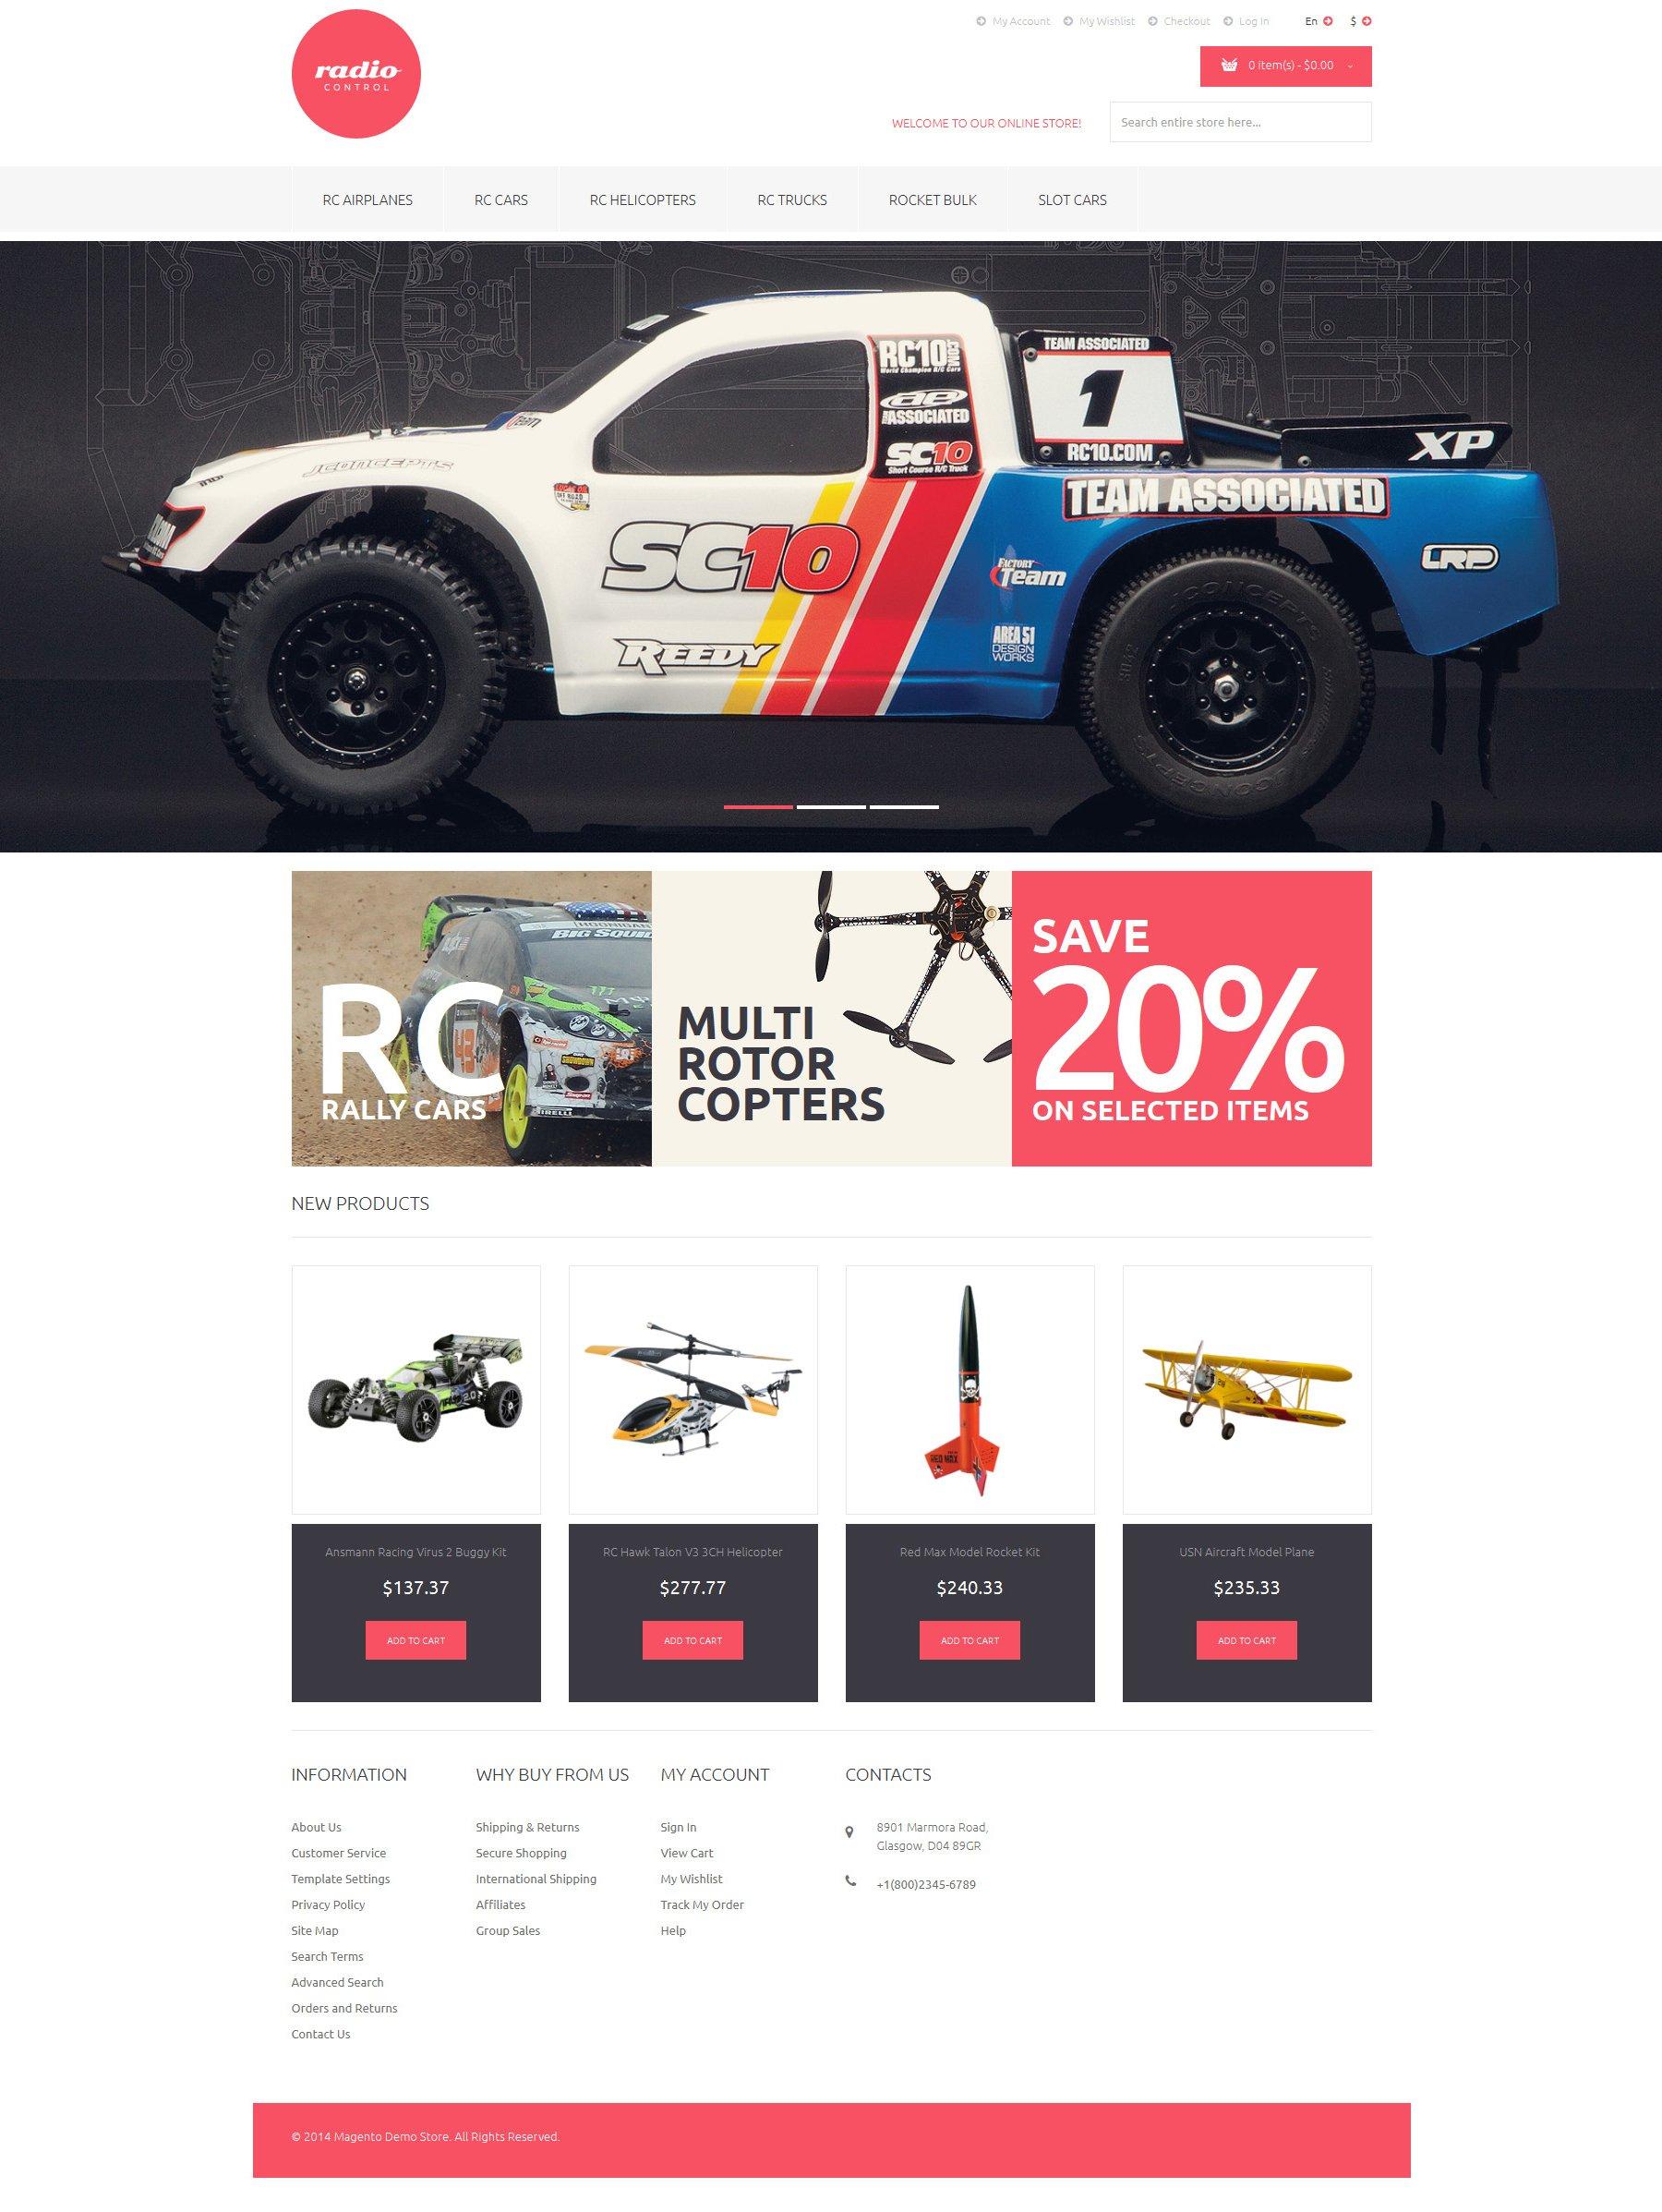 RemoteControlled Toys Magento Theme - screenshot